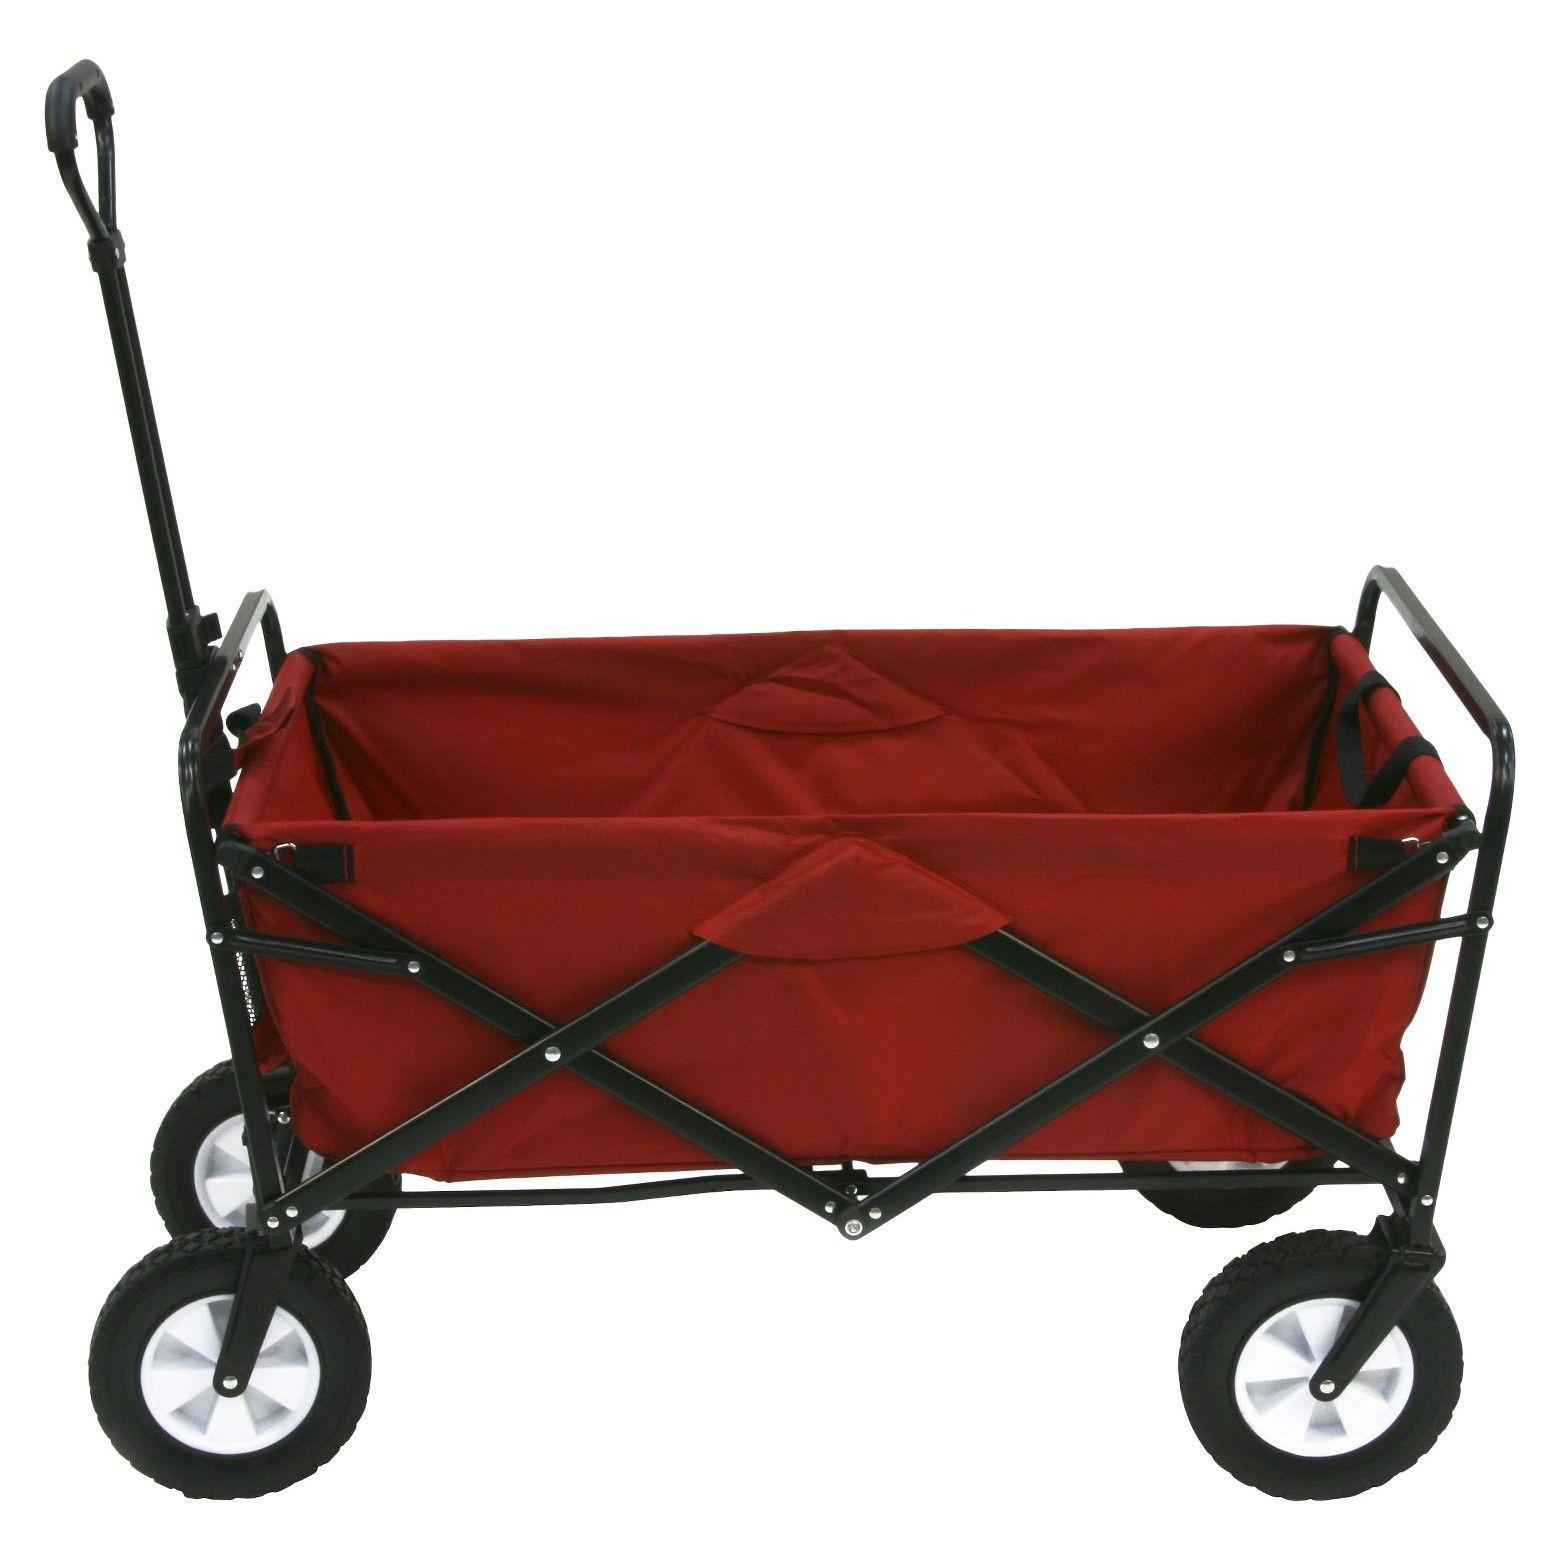 Mac Sports Folding Wagon Red Folding wagon, Utility